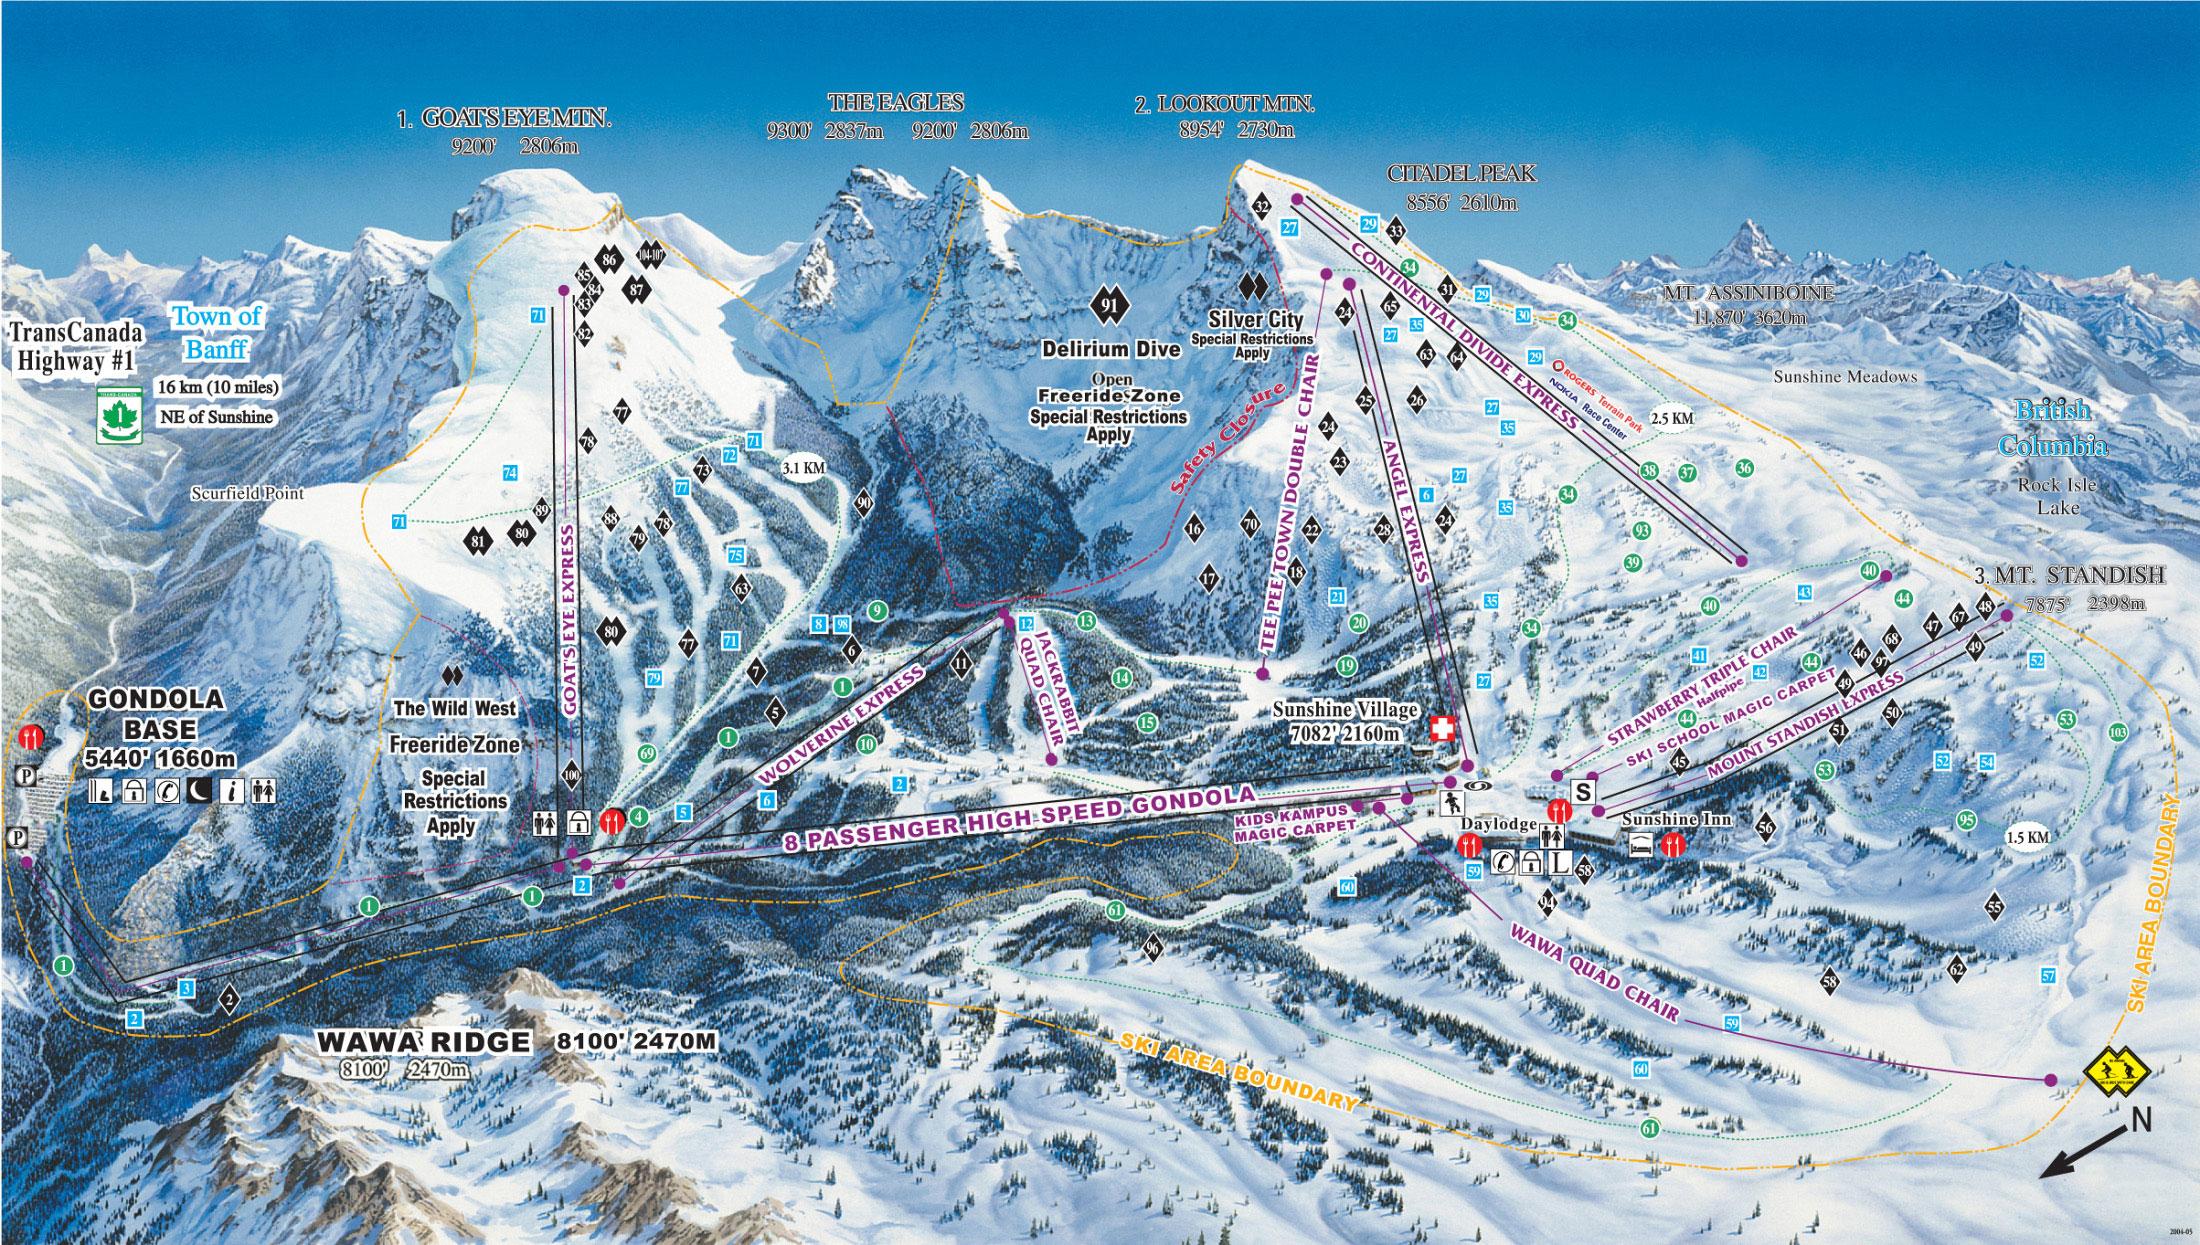 Banff piste map